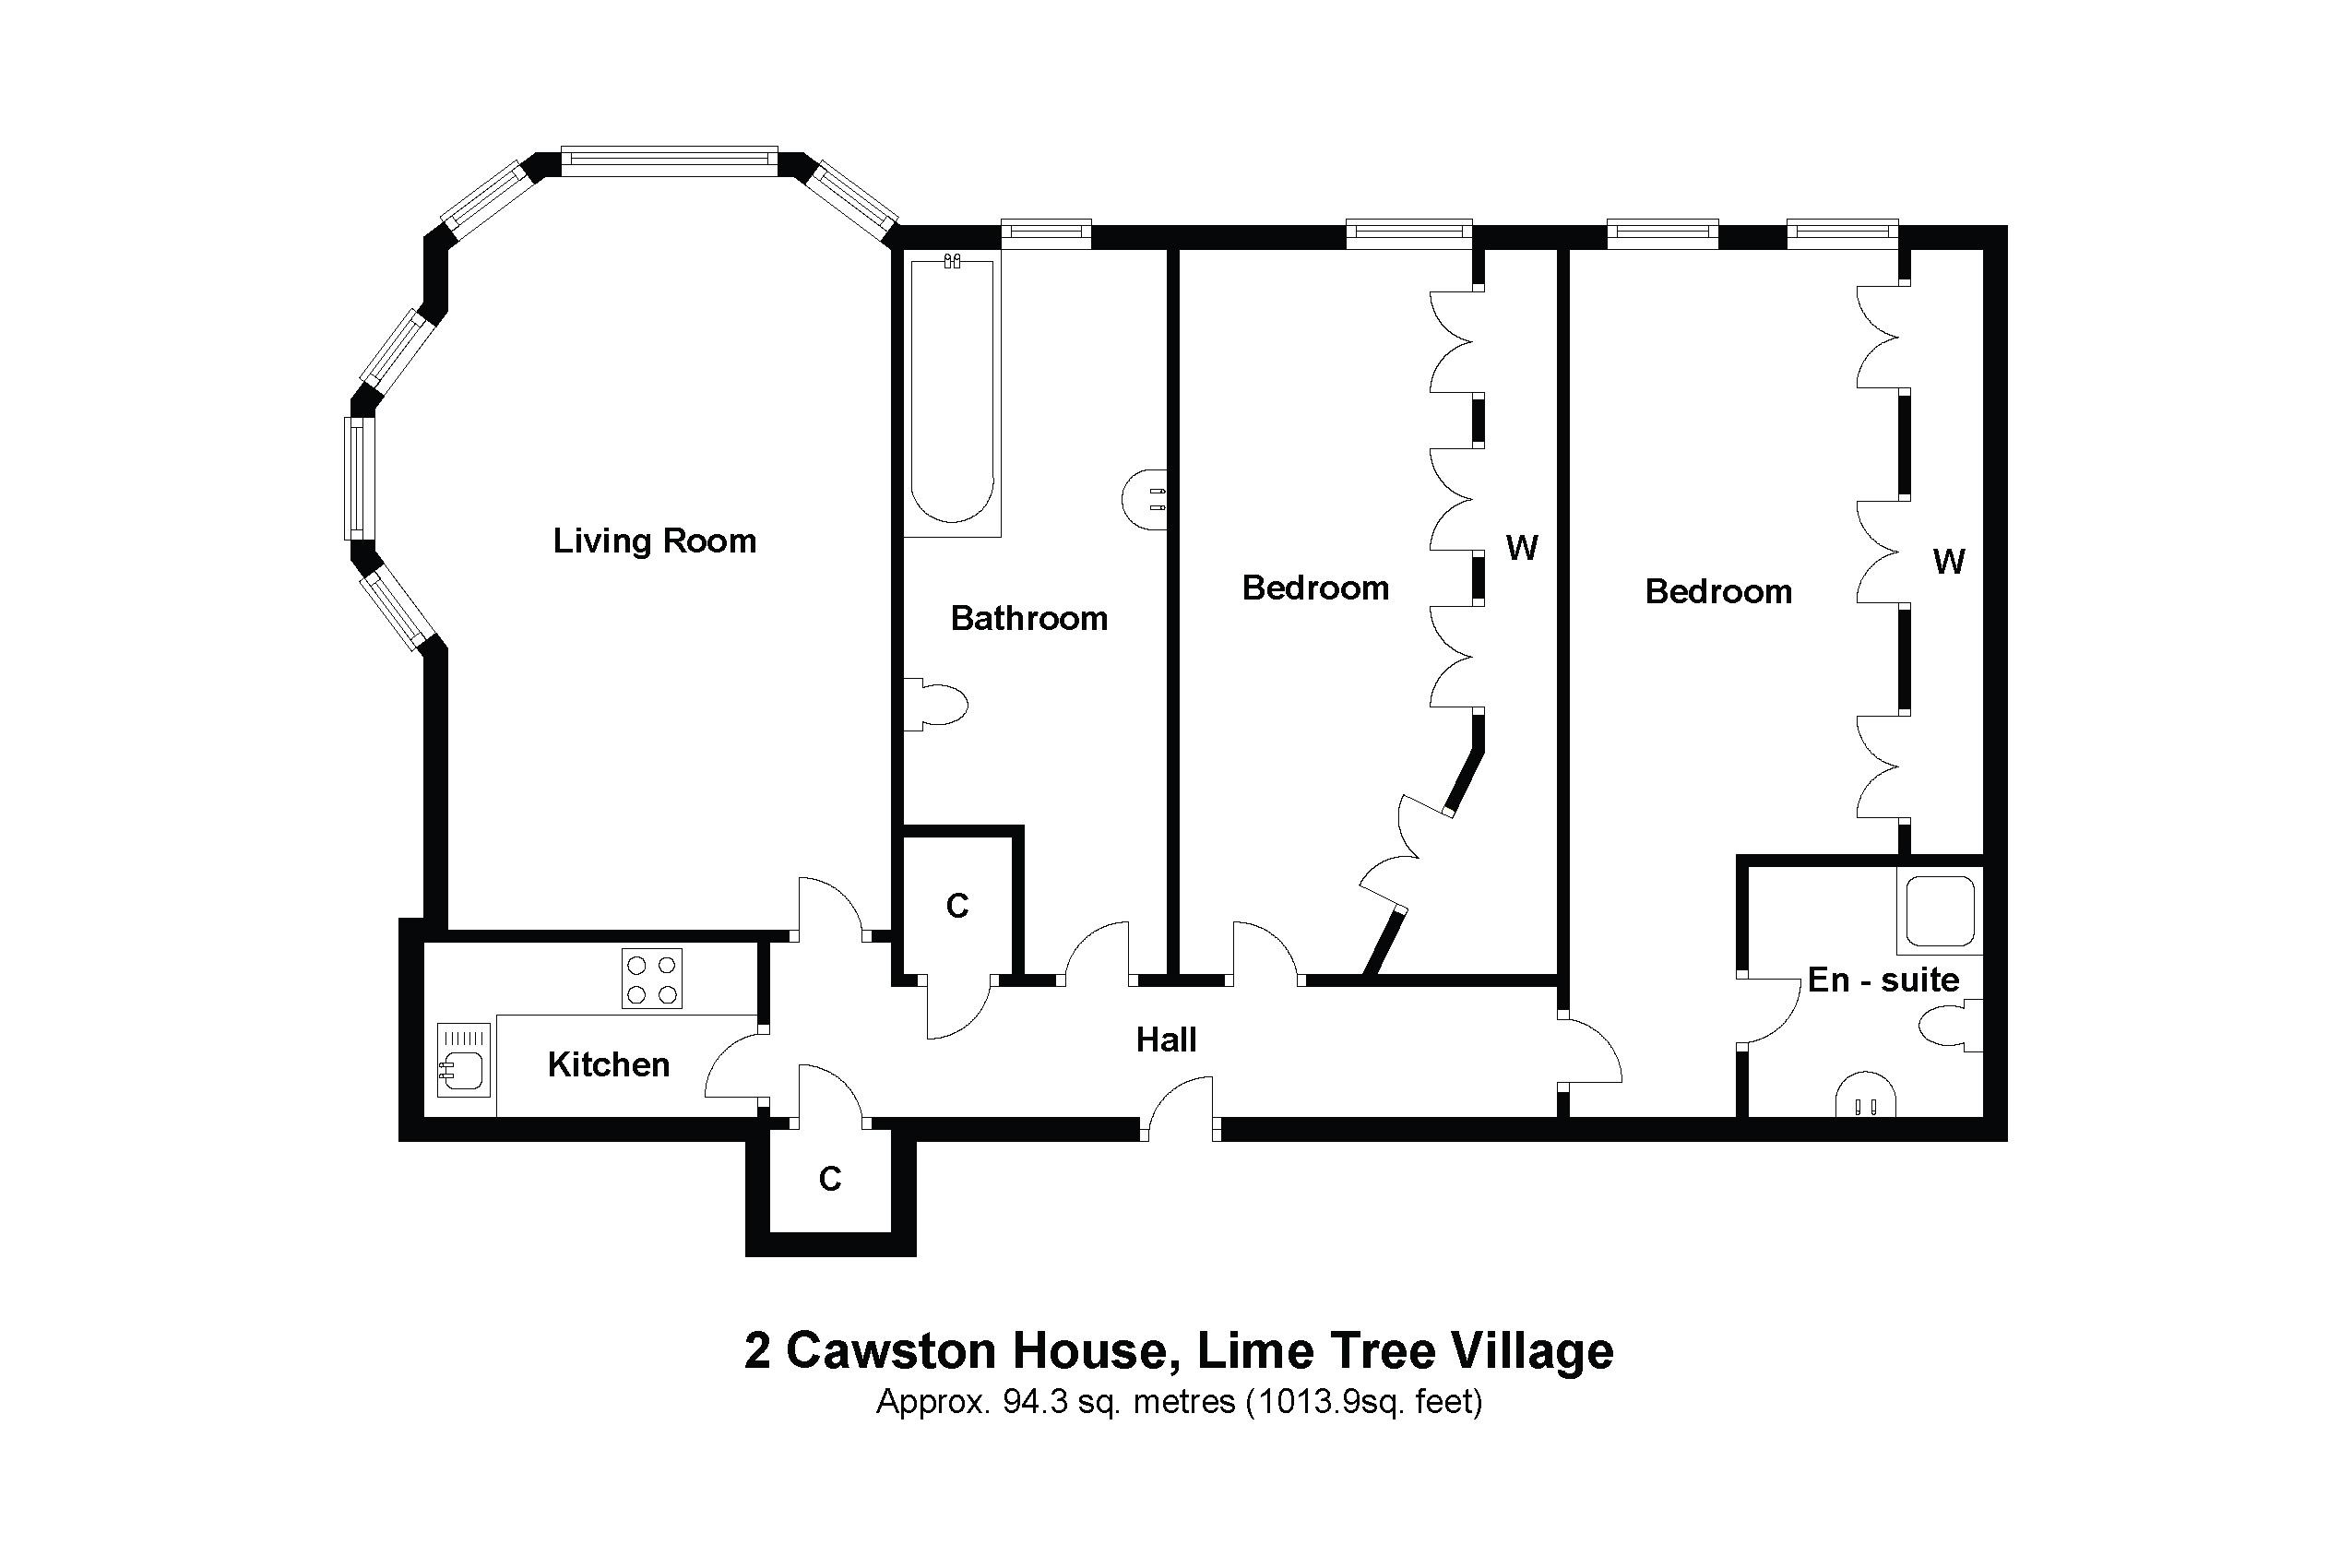 2 Cawston House Floorplan